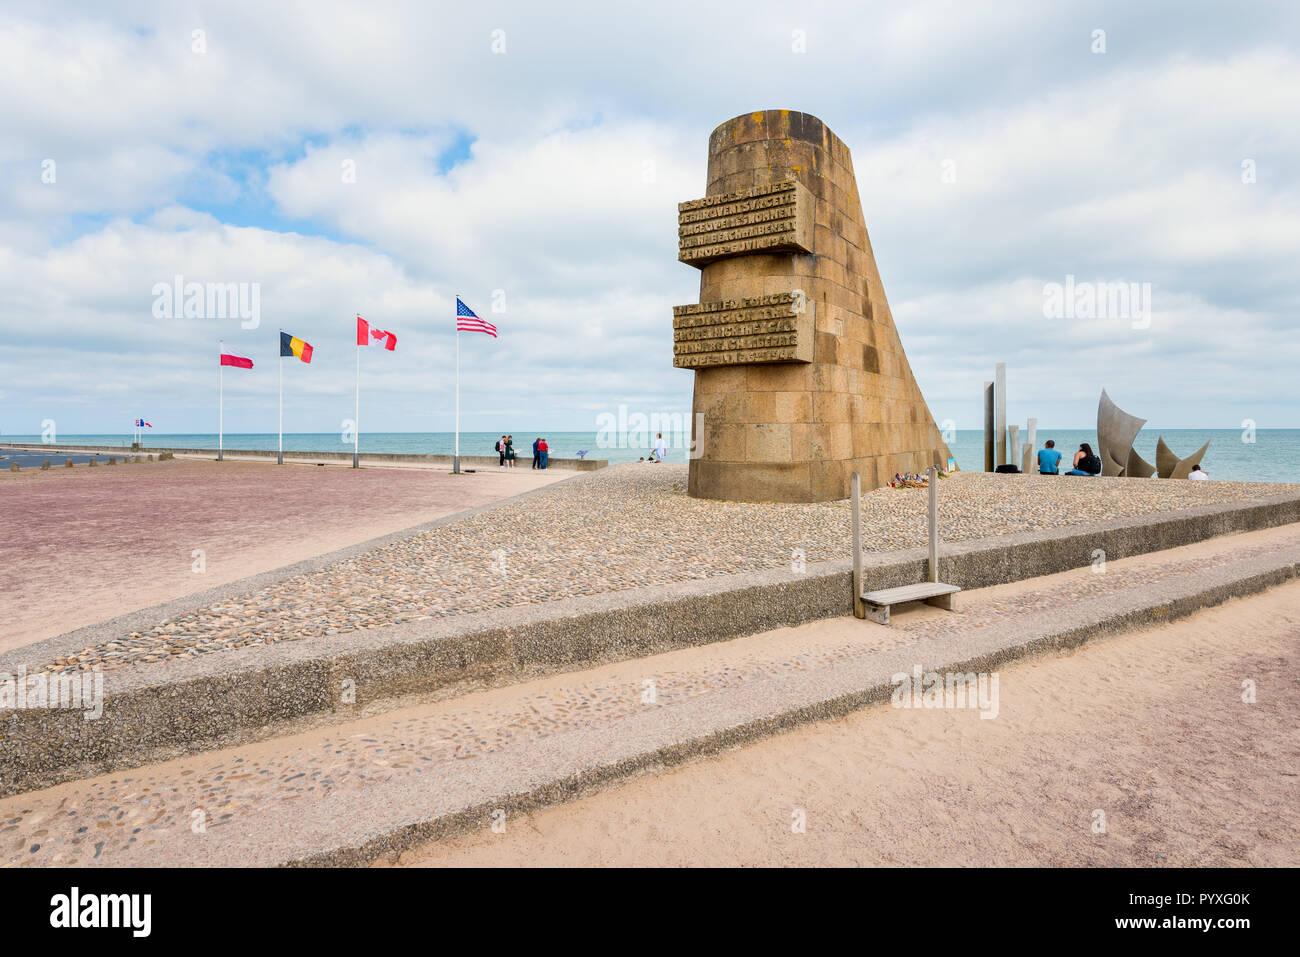 Omaha Beach Monument in Saint-Laurent-sur-Mer Normandy France - Stock Image